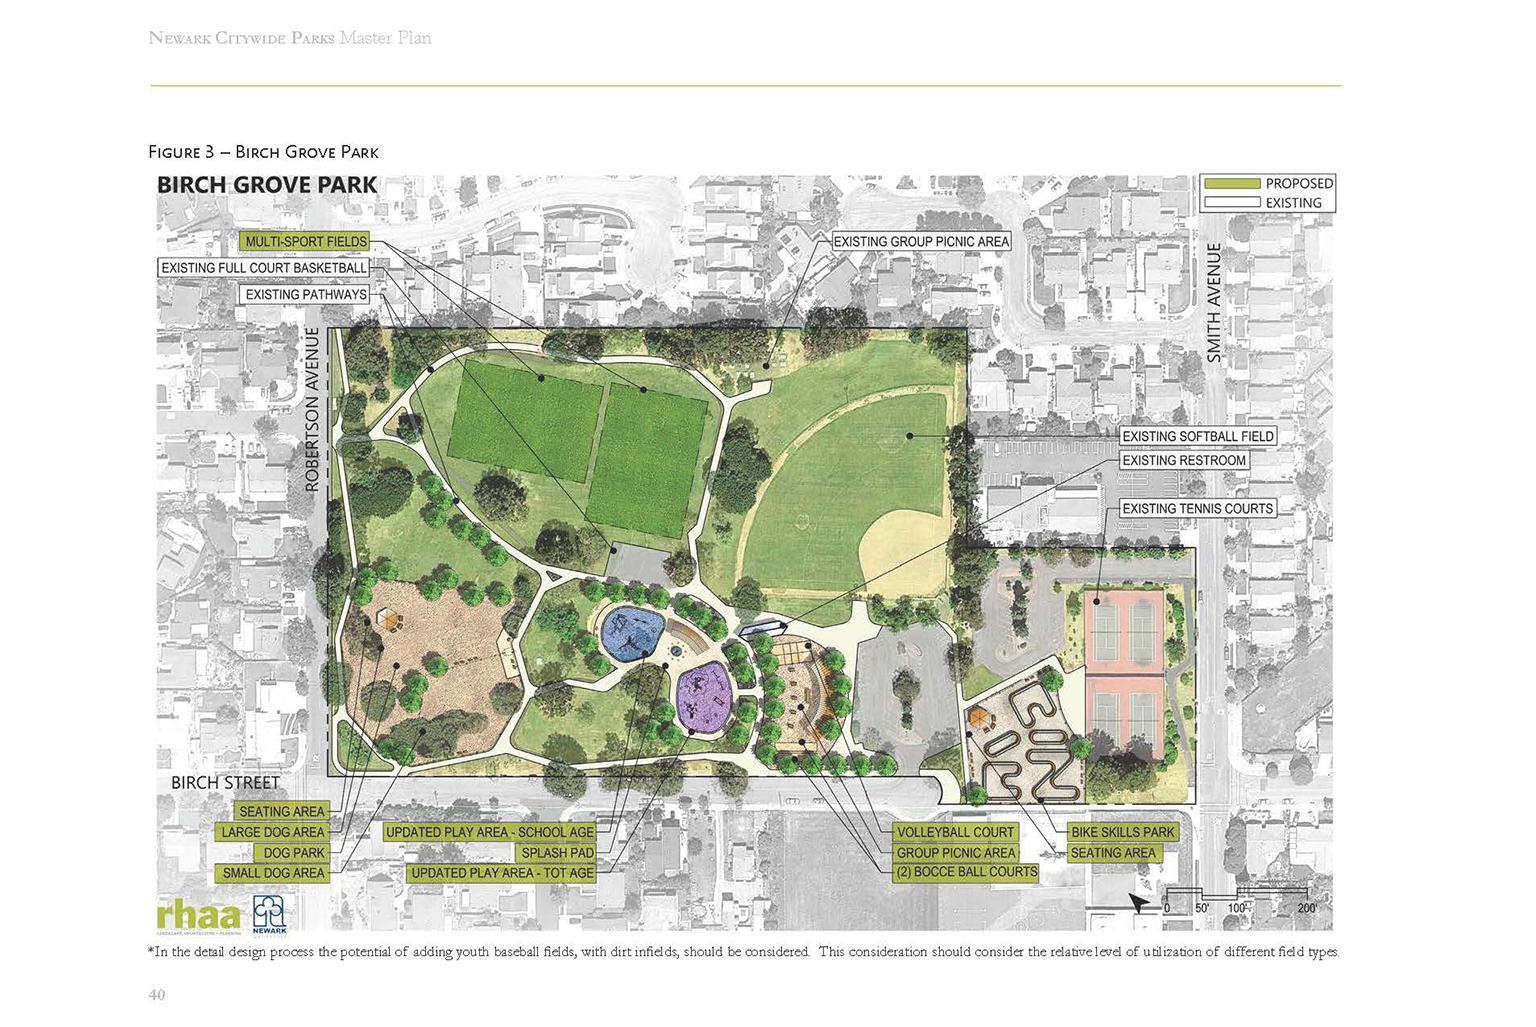 Newark City Wide Master Plan